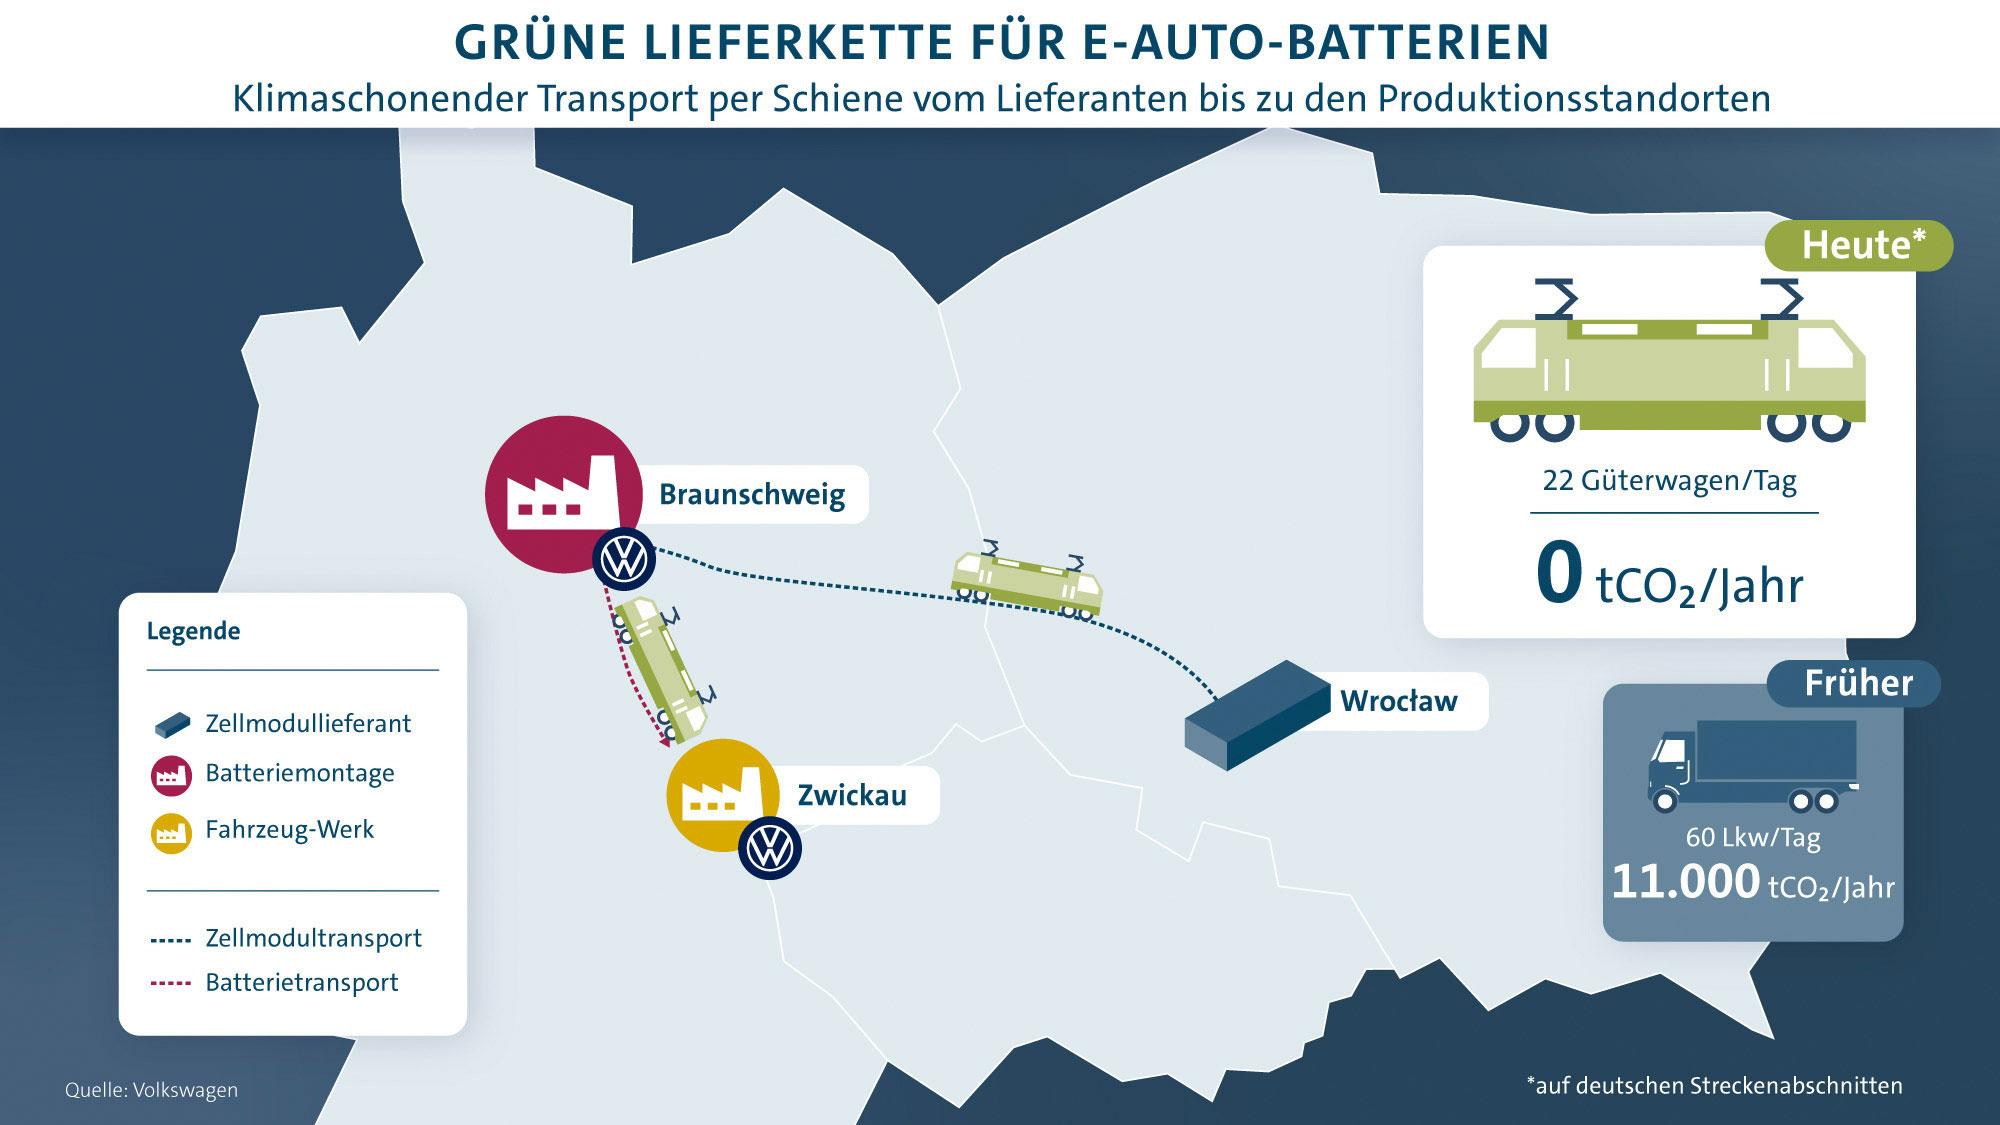 VW-Lieferkette-E-Auto-Batterien-Deutschland